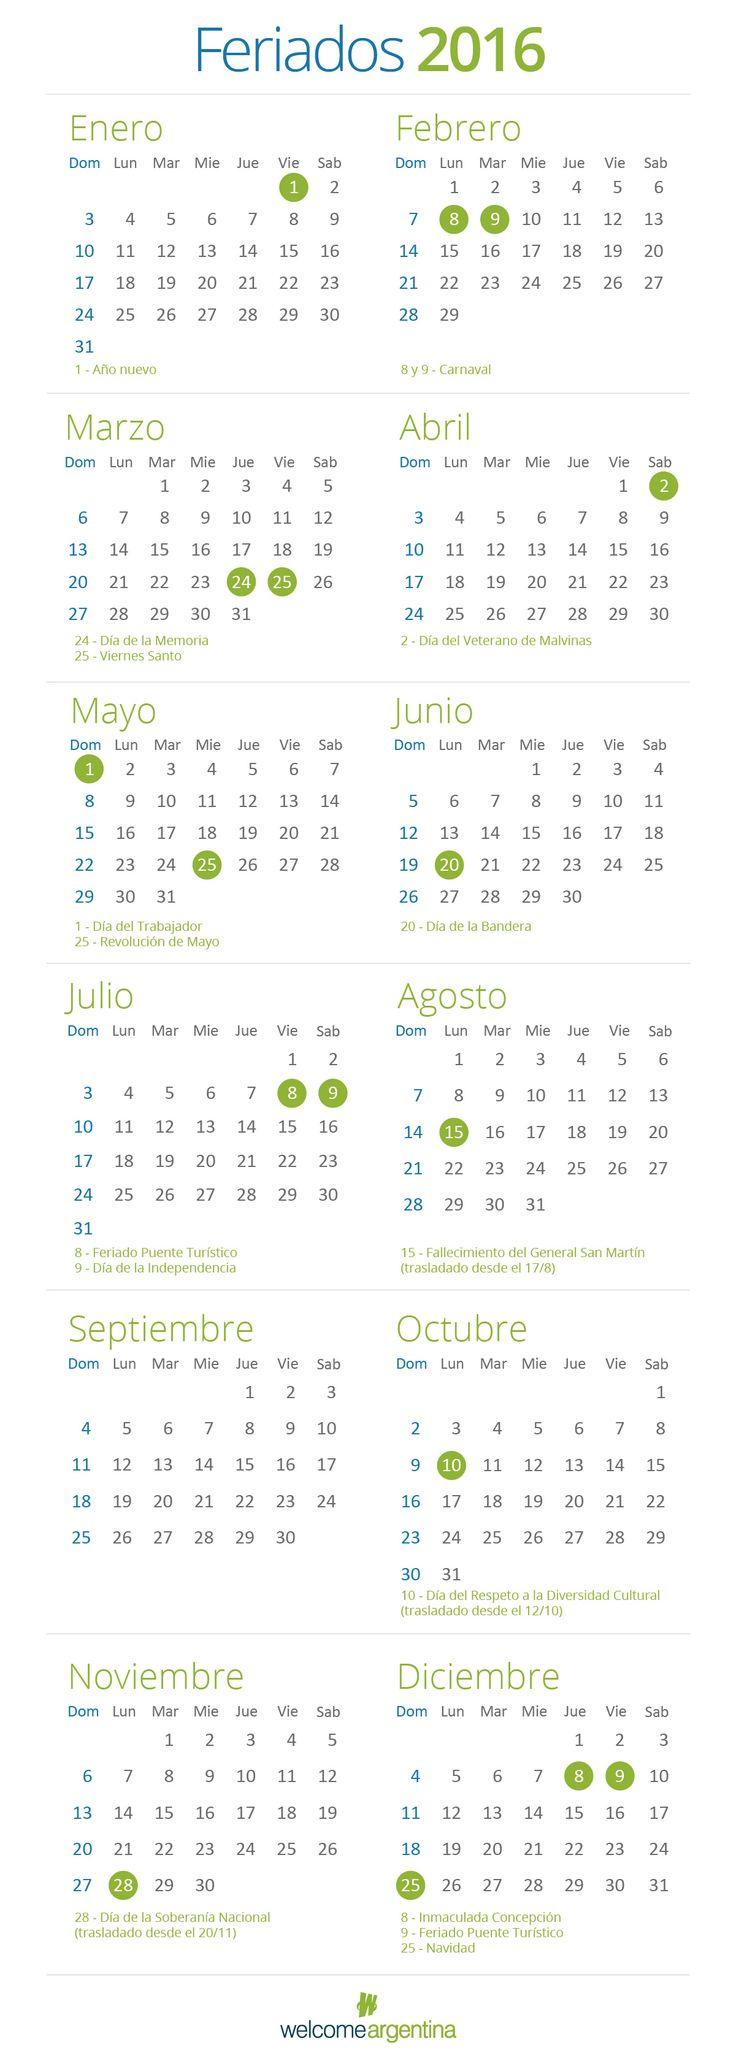 Feriados 2016 - Calendario de feriados en Argentina